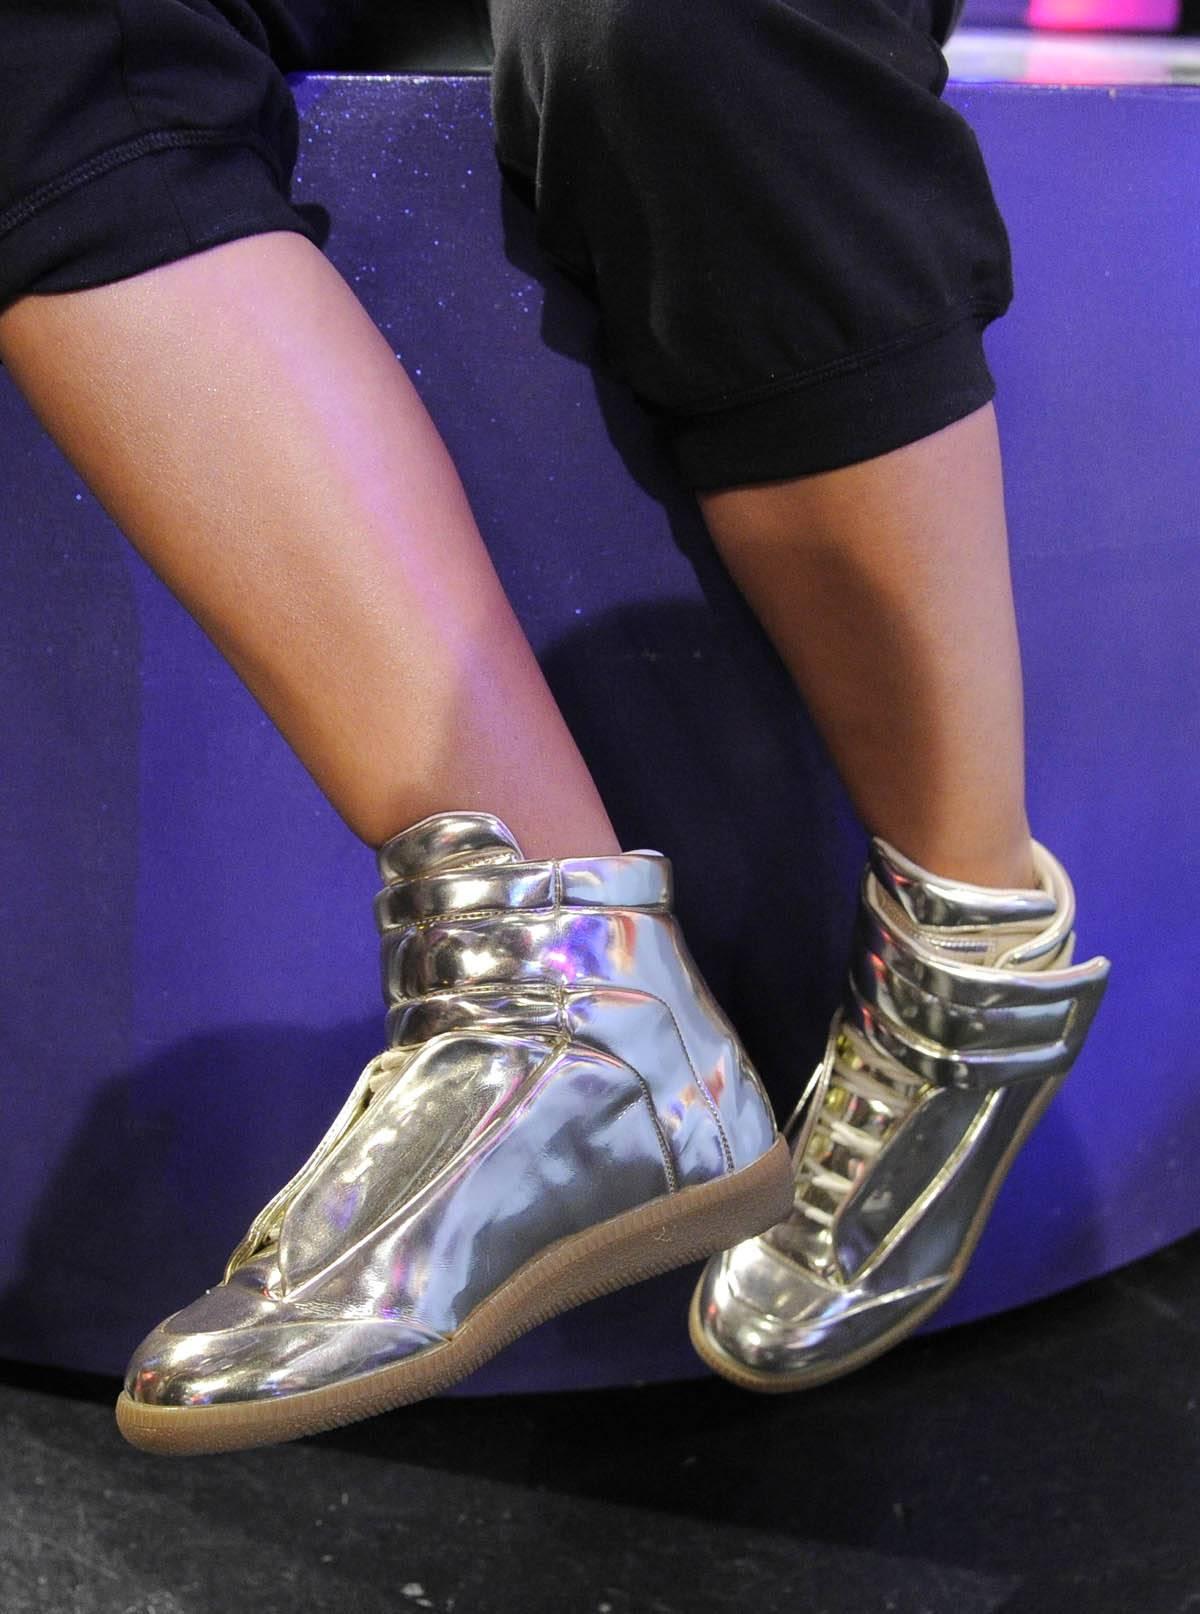 Kicks Go Hard - Rocsi Diaz at 106 & Park, January 27, 2012. (Photo: John Ricard / BET)